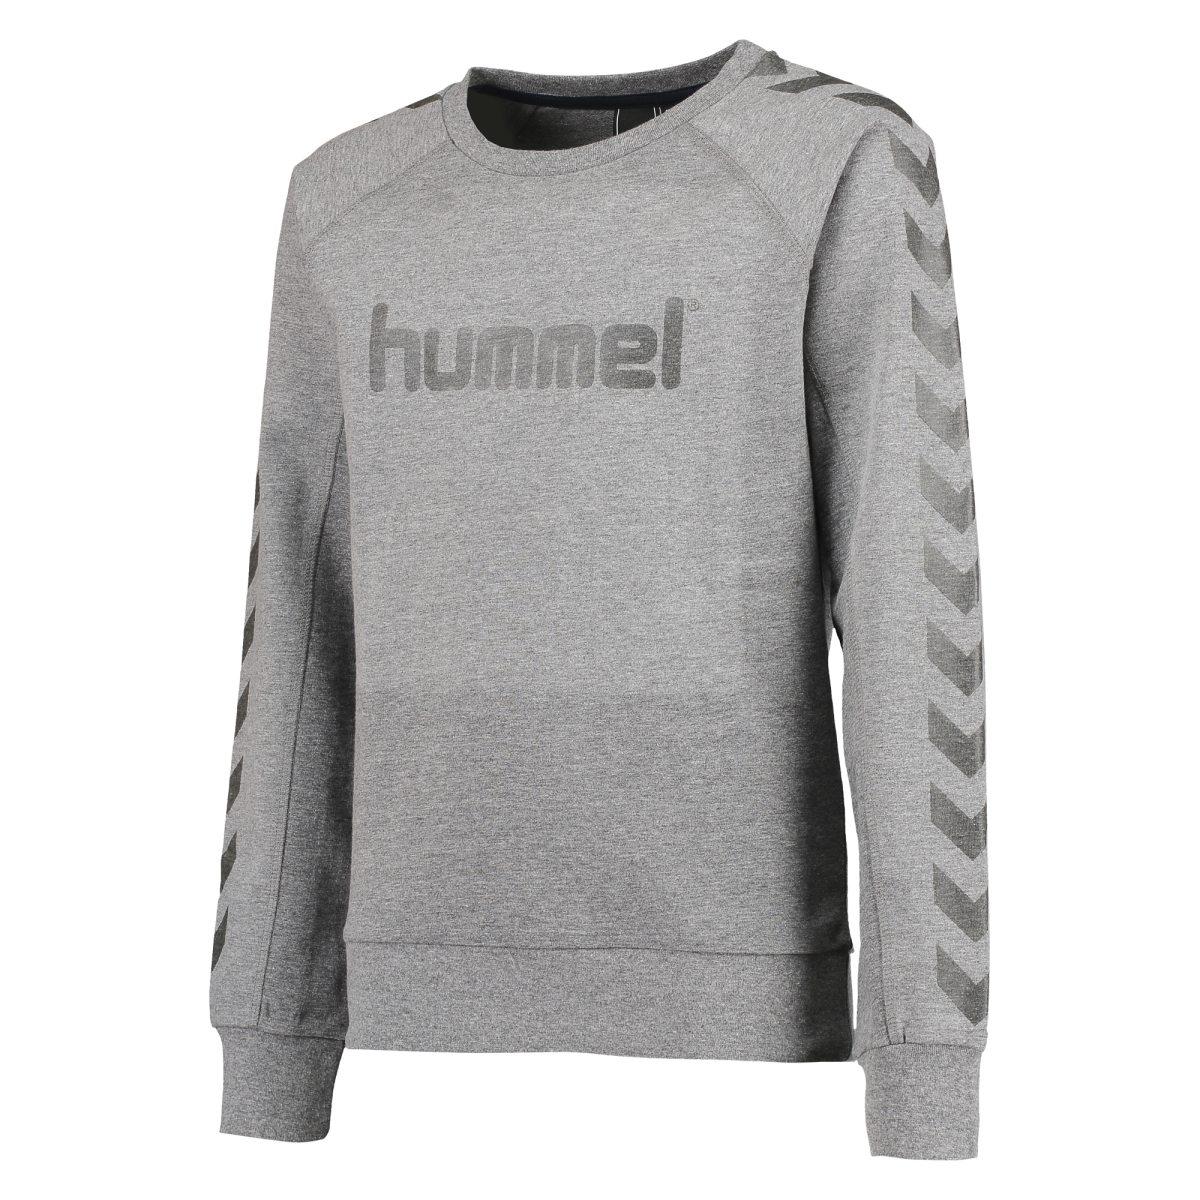 9fcd9951 Find hummel lukas genser. Shop every store on the internet via ...